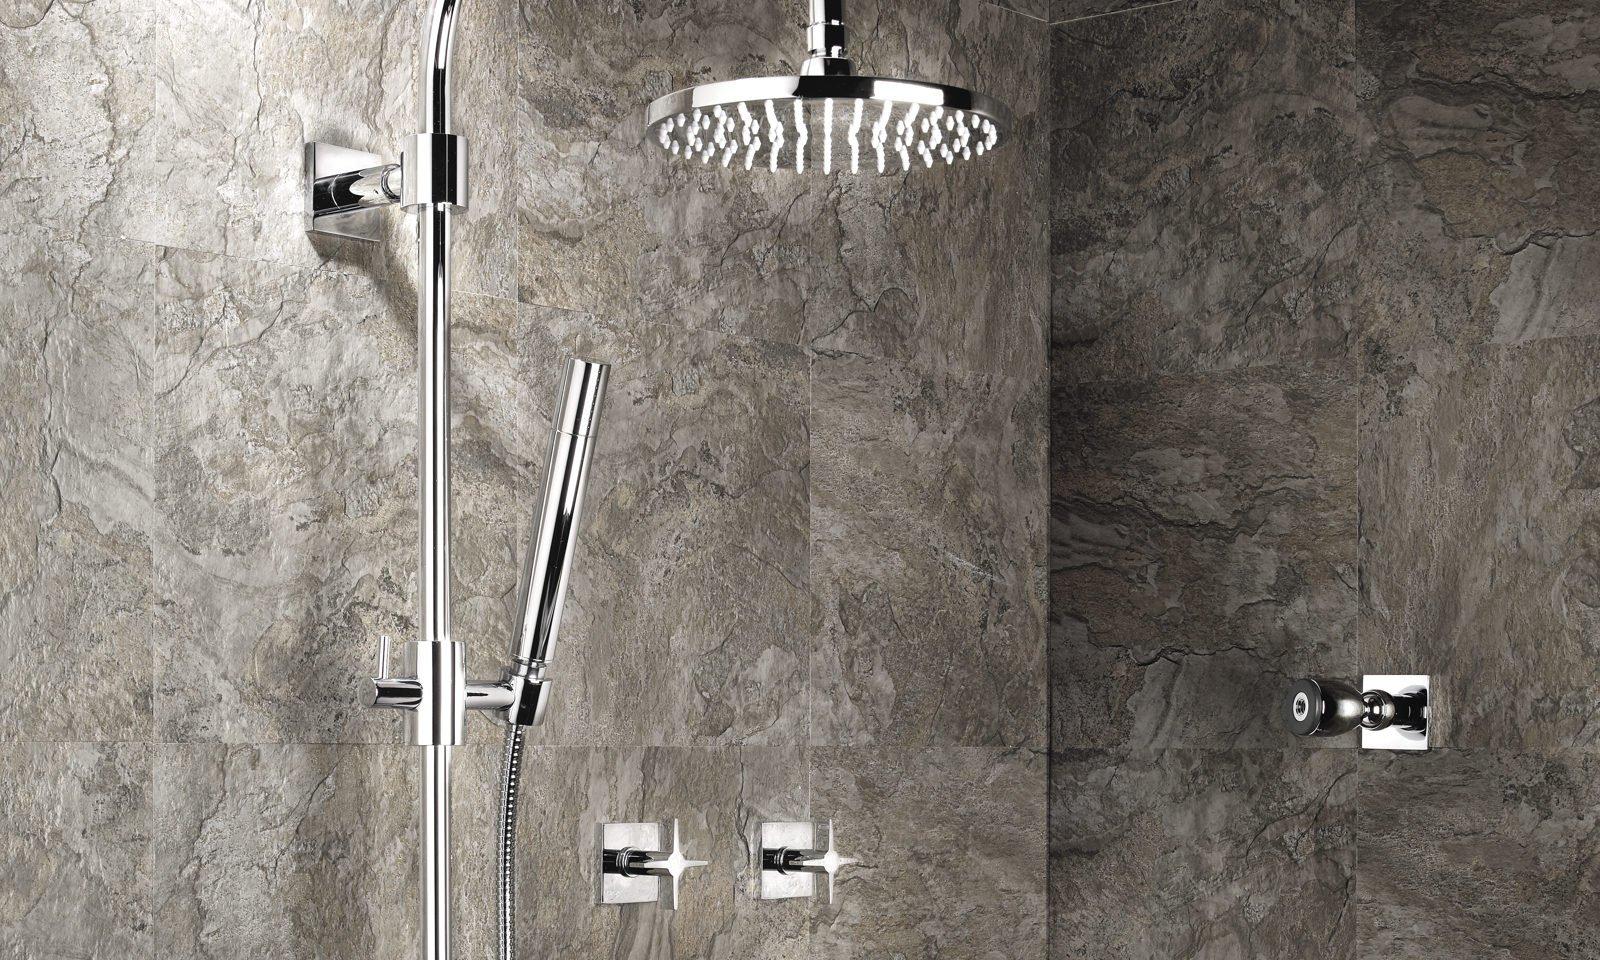 luxury thermostatic shower with showerhead, handshower, and body sprays